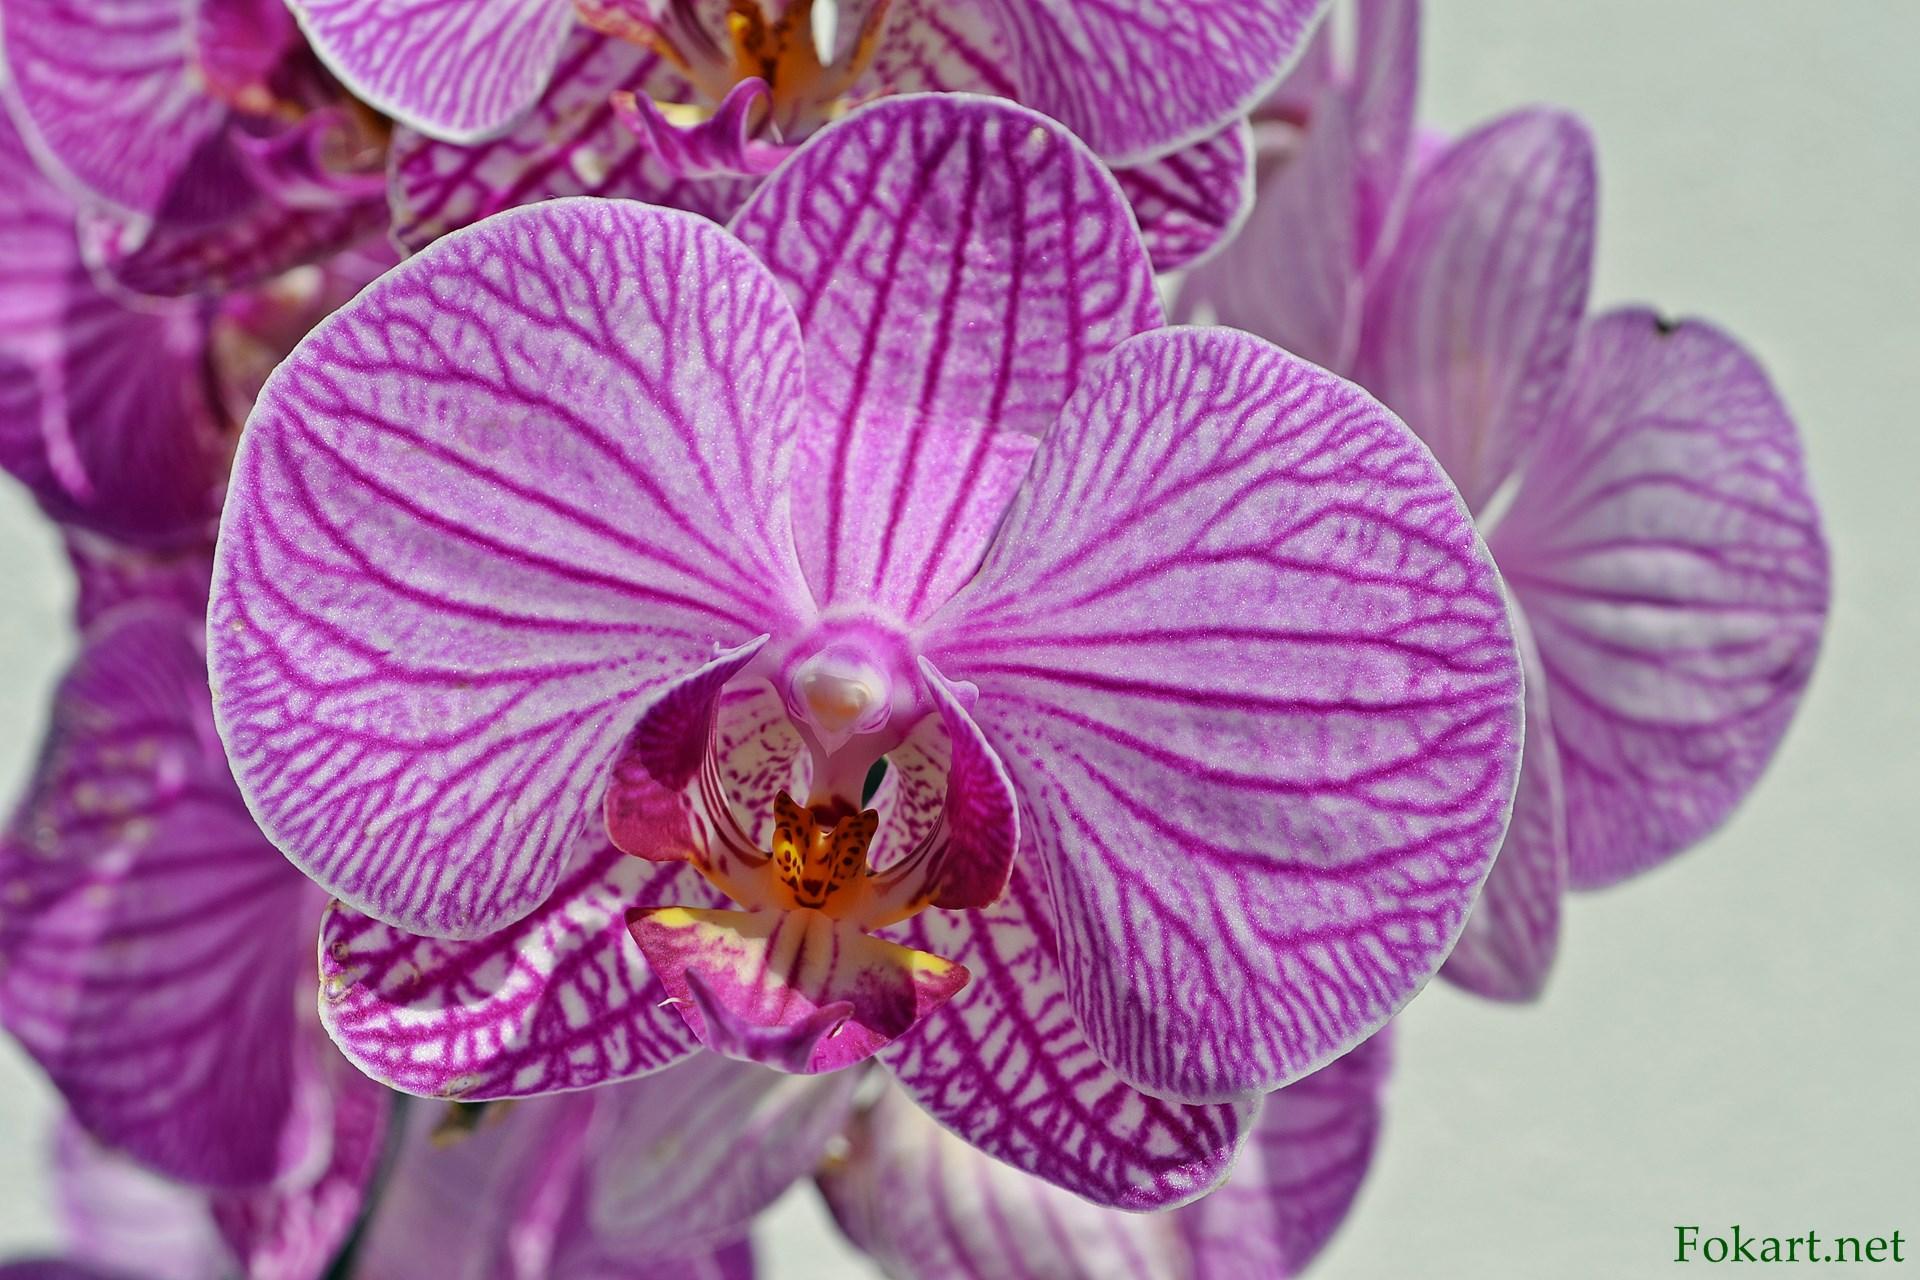 Пурпурный с белым цветок фаленопсиса на весь экран